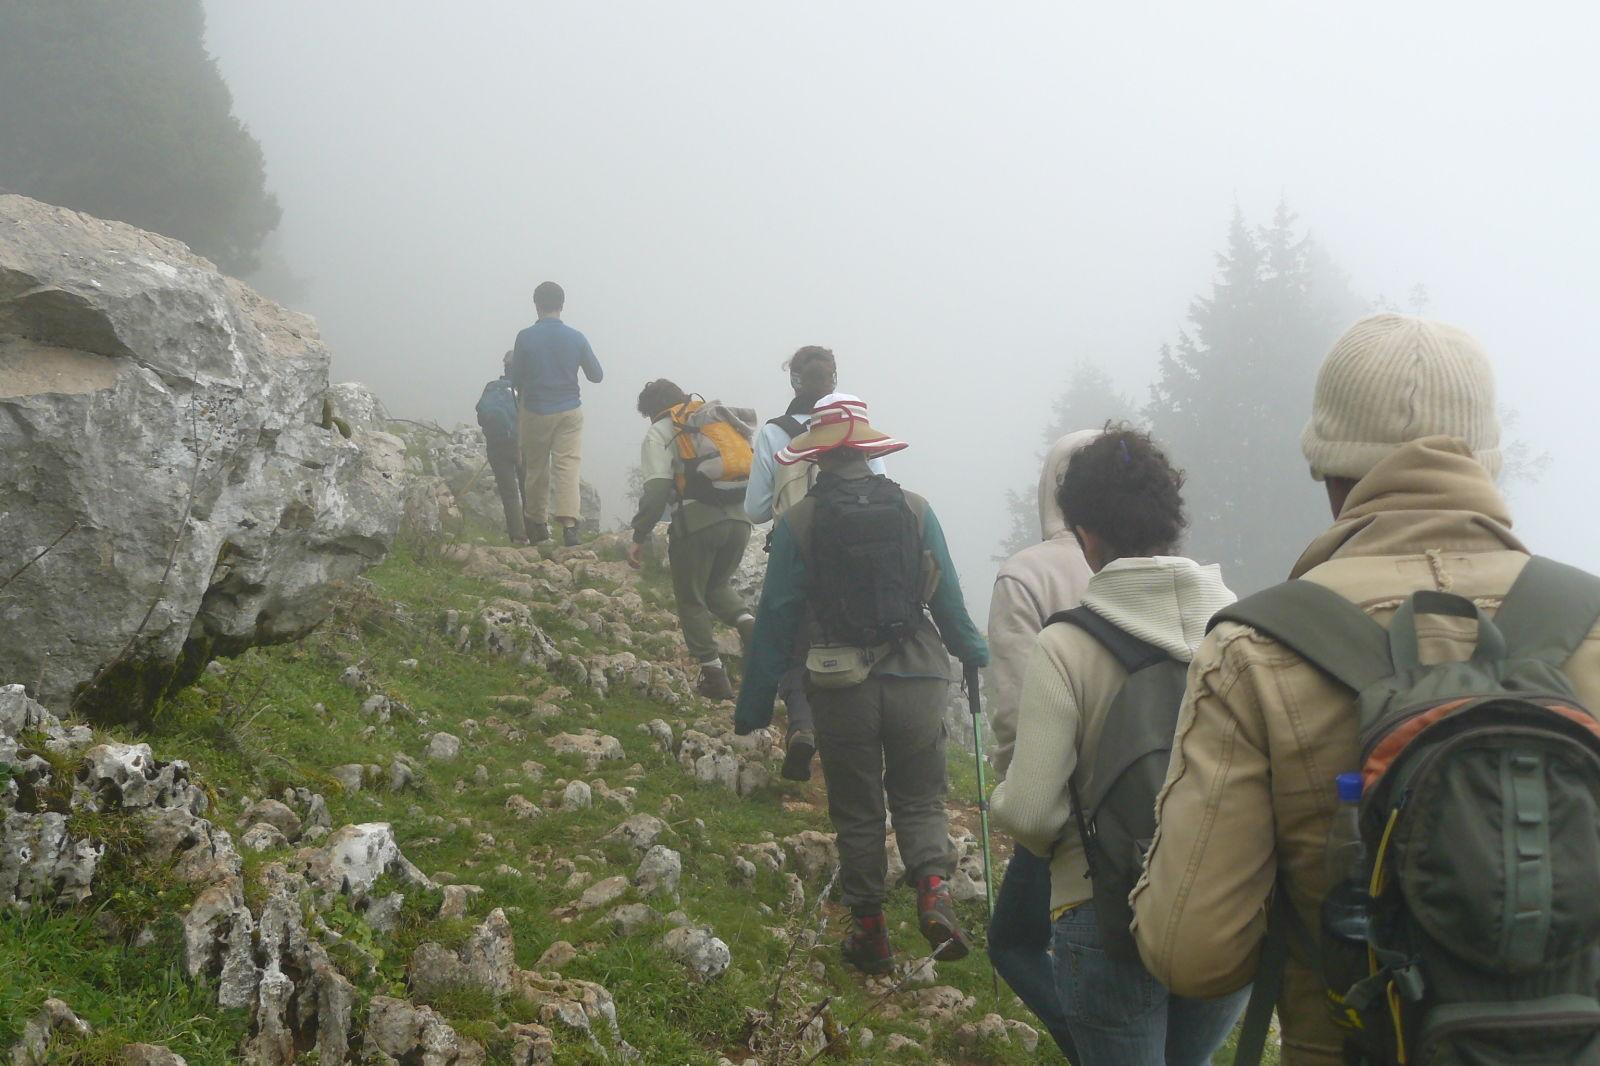 Trekking in the lebanon mountains iighun